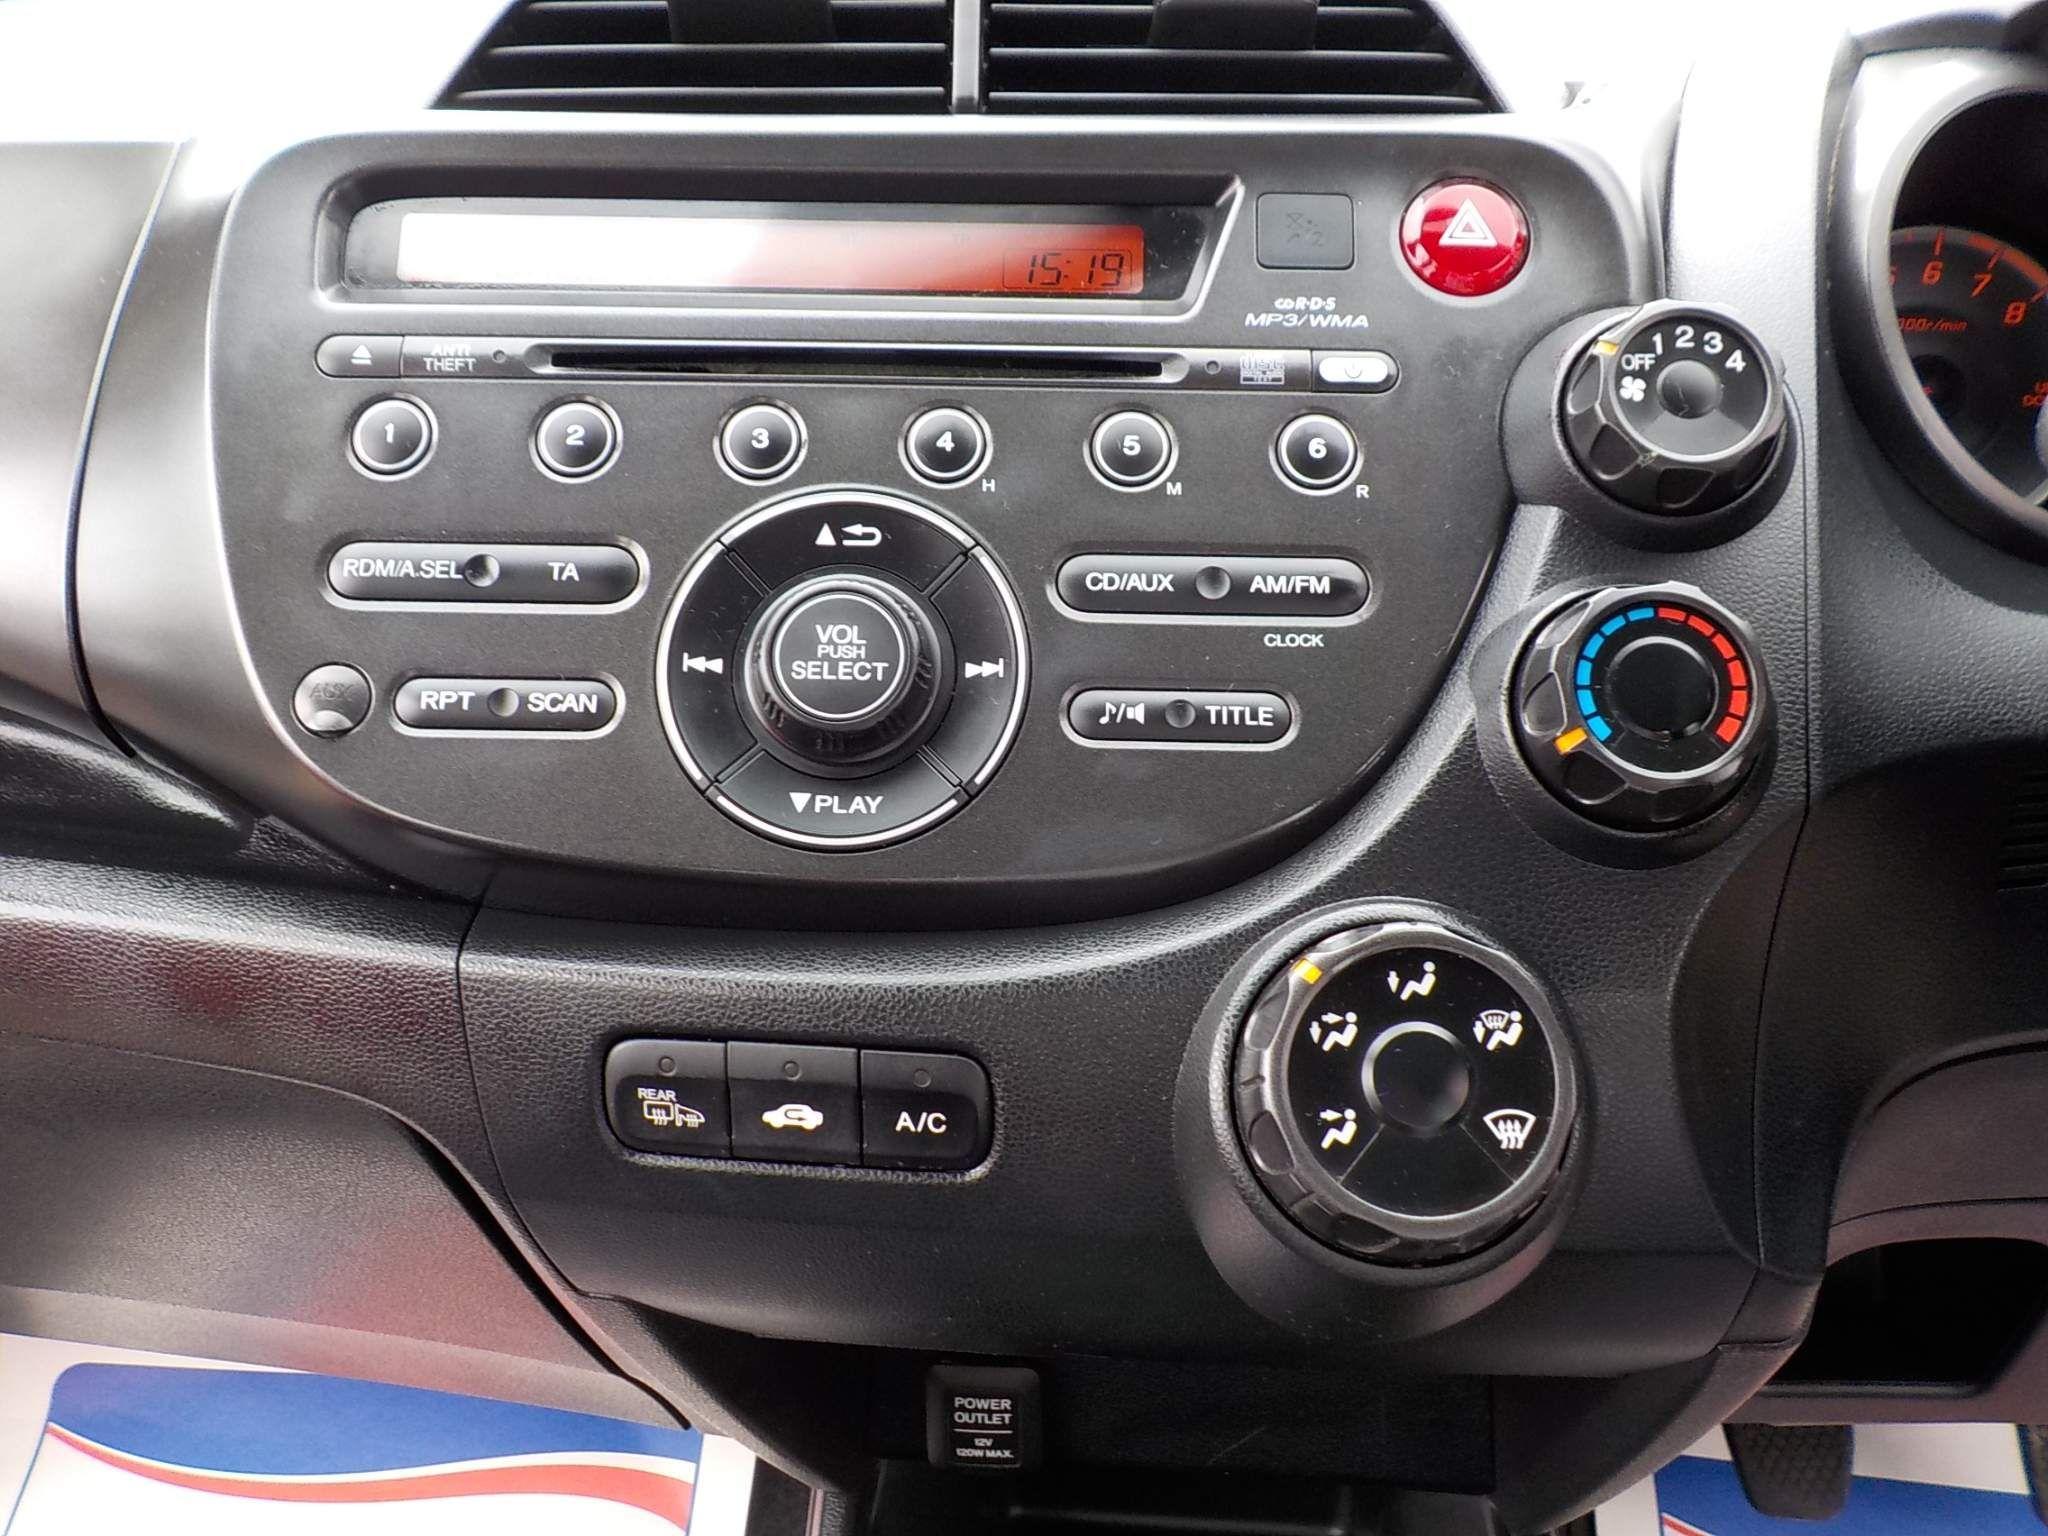 Honda Jazz 1.2 i-VTEC S 5dr (VSA)